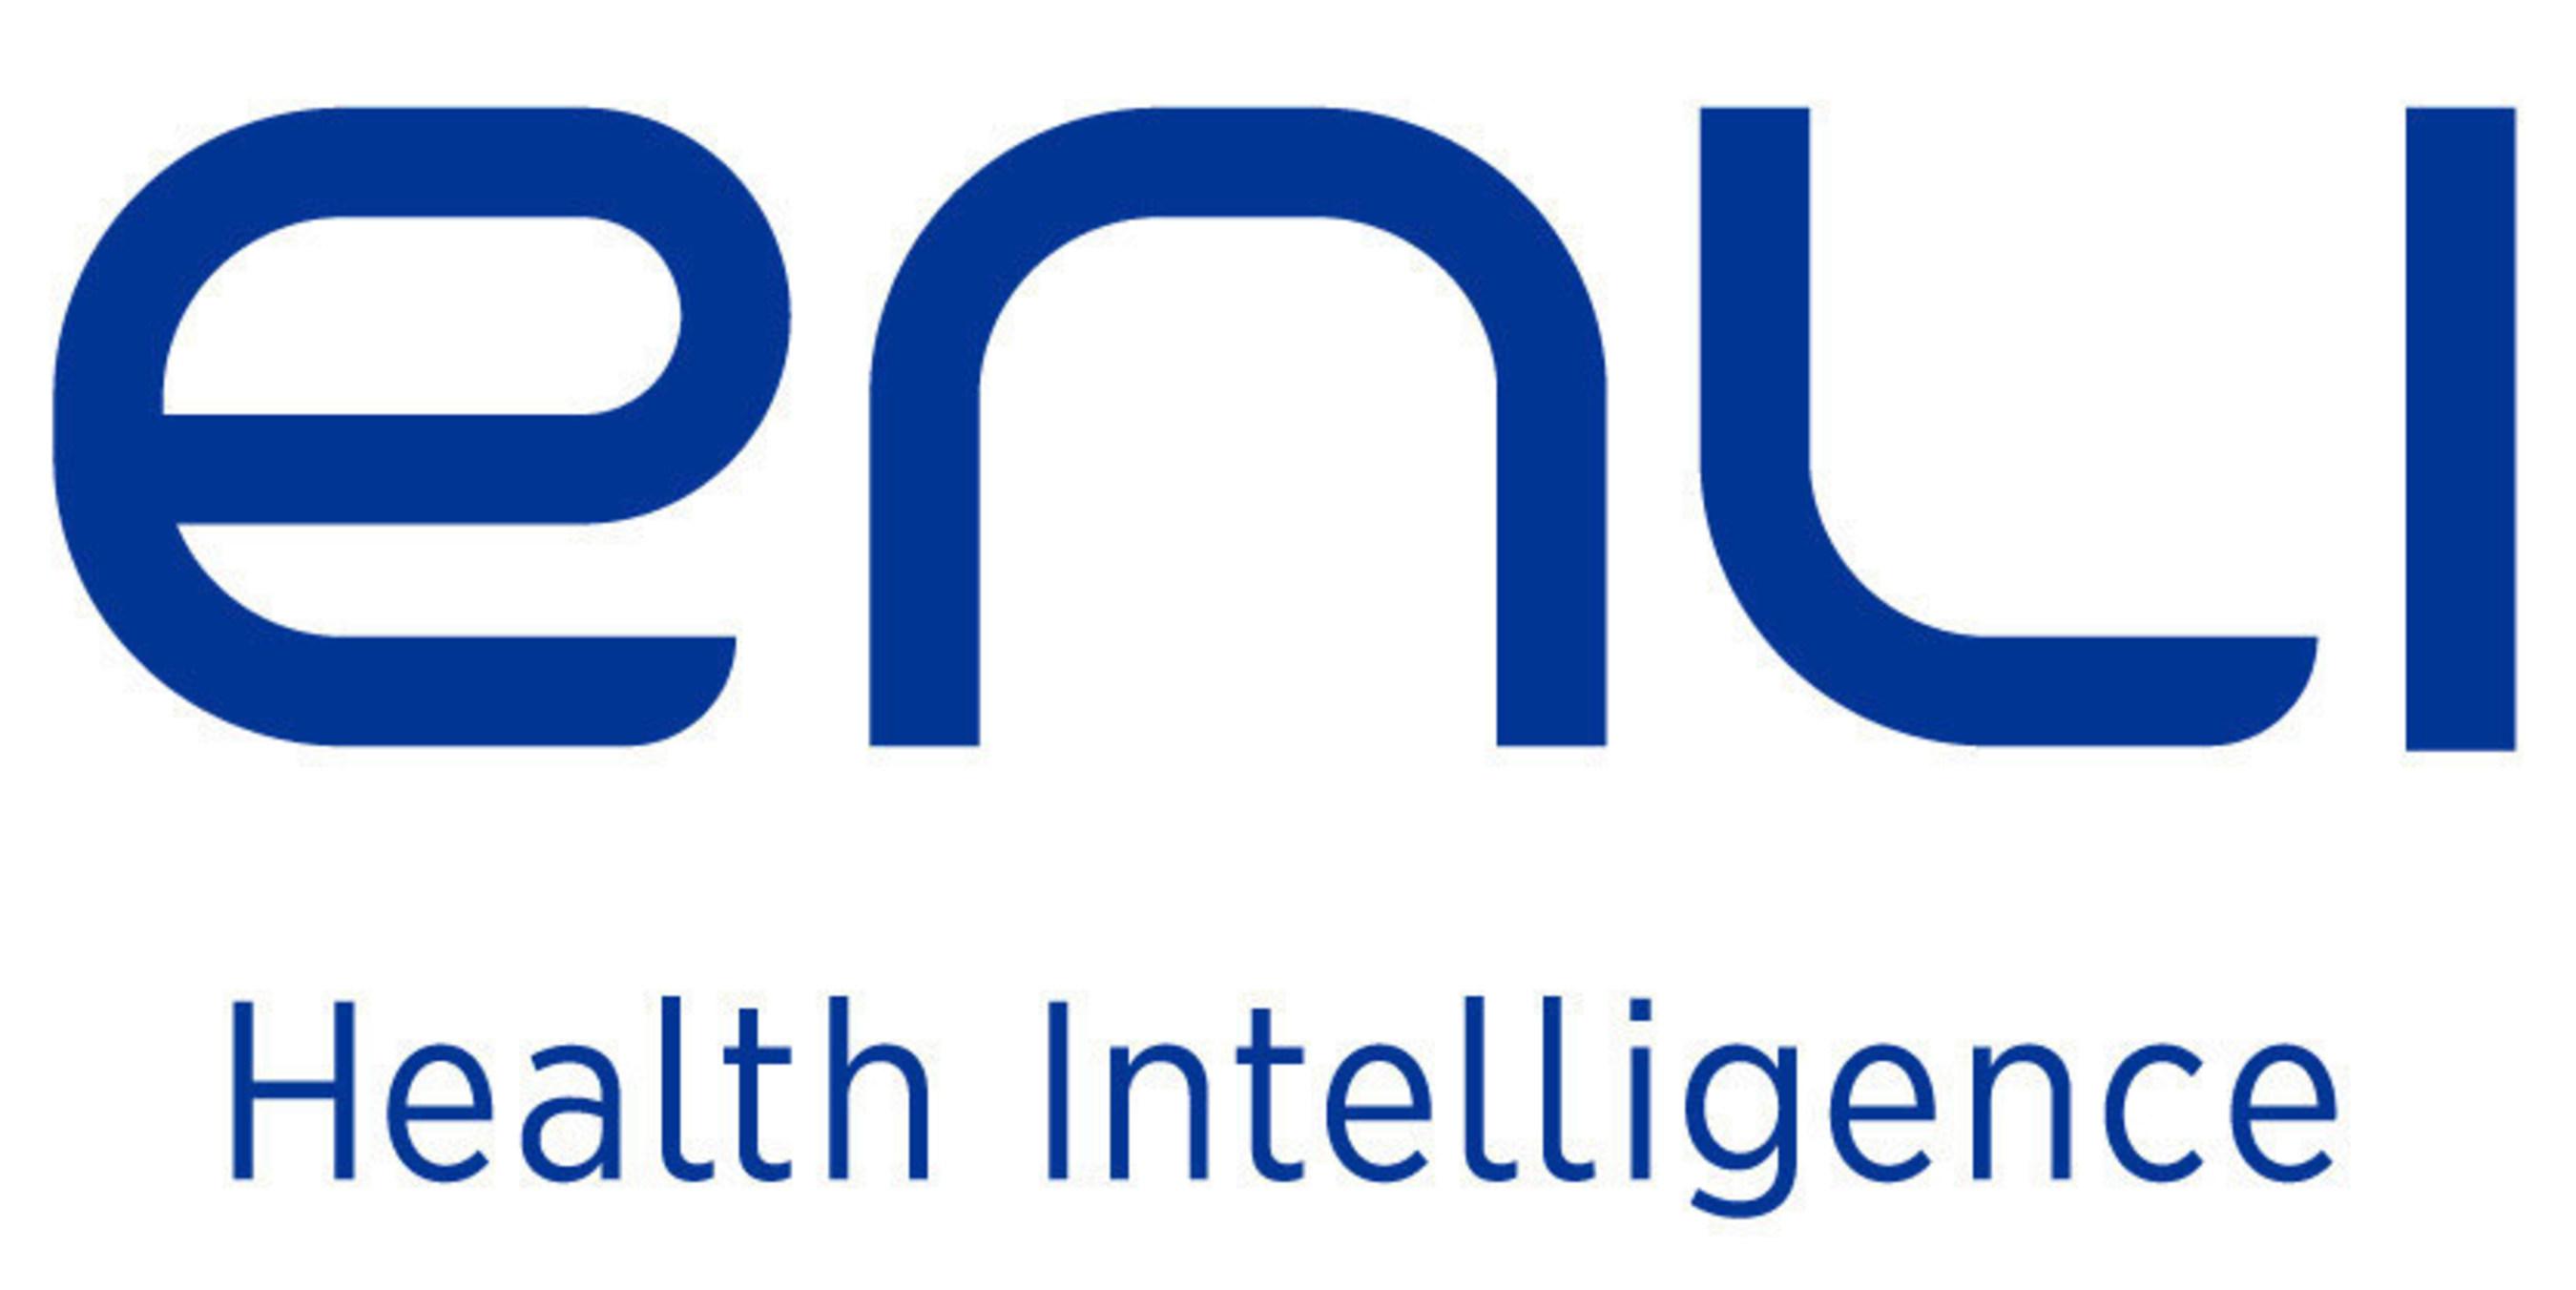 Enli Health Intelligence Identified as a Leader by IDC MarketScape